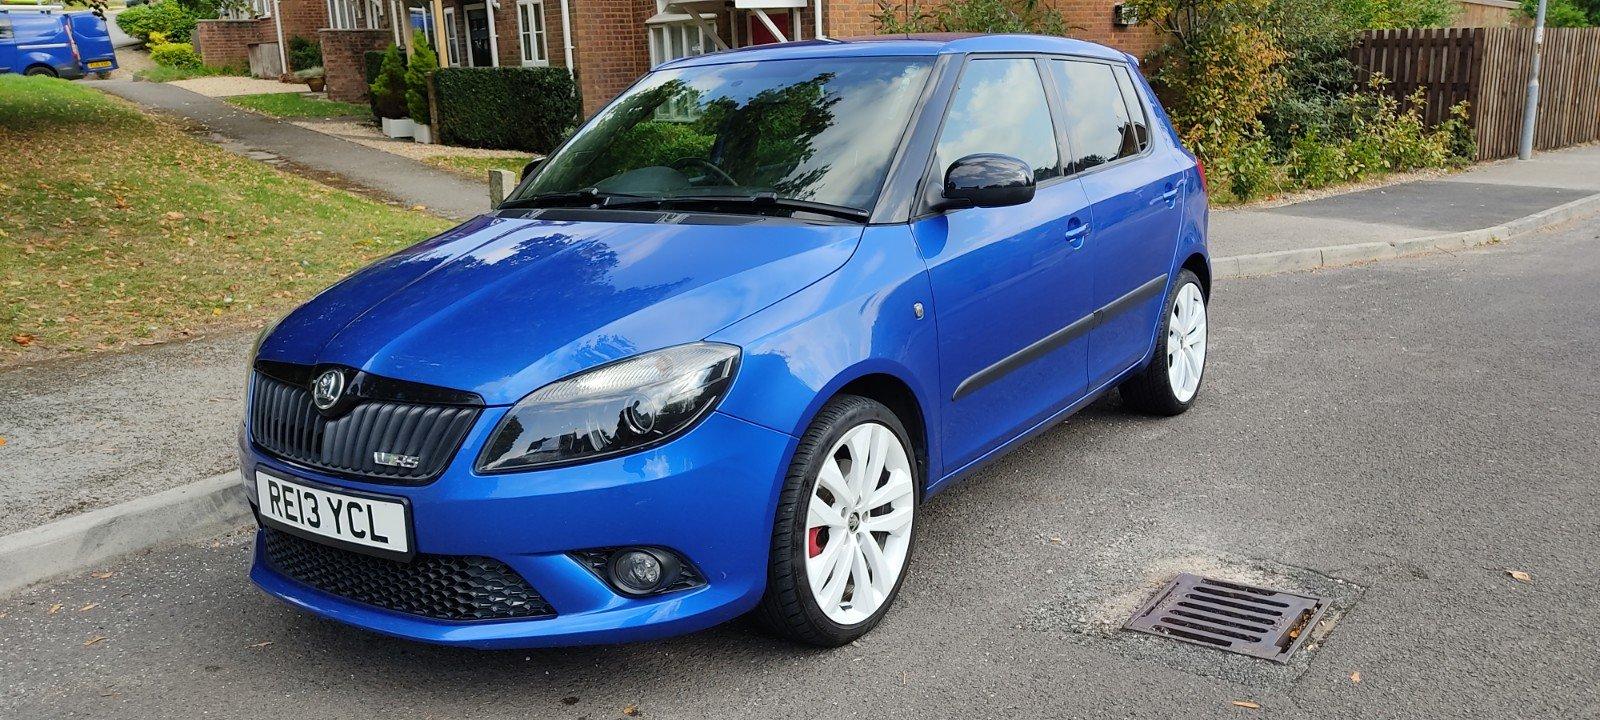 2013 Skoda Fabia VRS Hatch, FSH, 57k miles, Blue For Sale (picture 1 of 6)